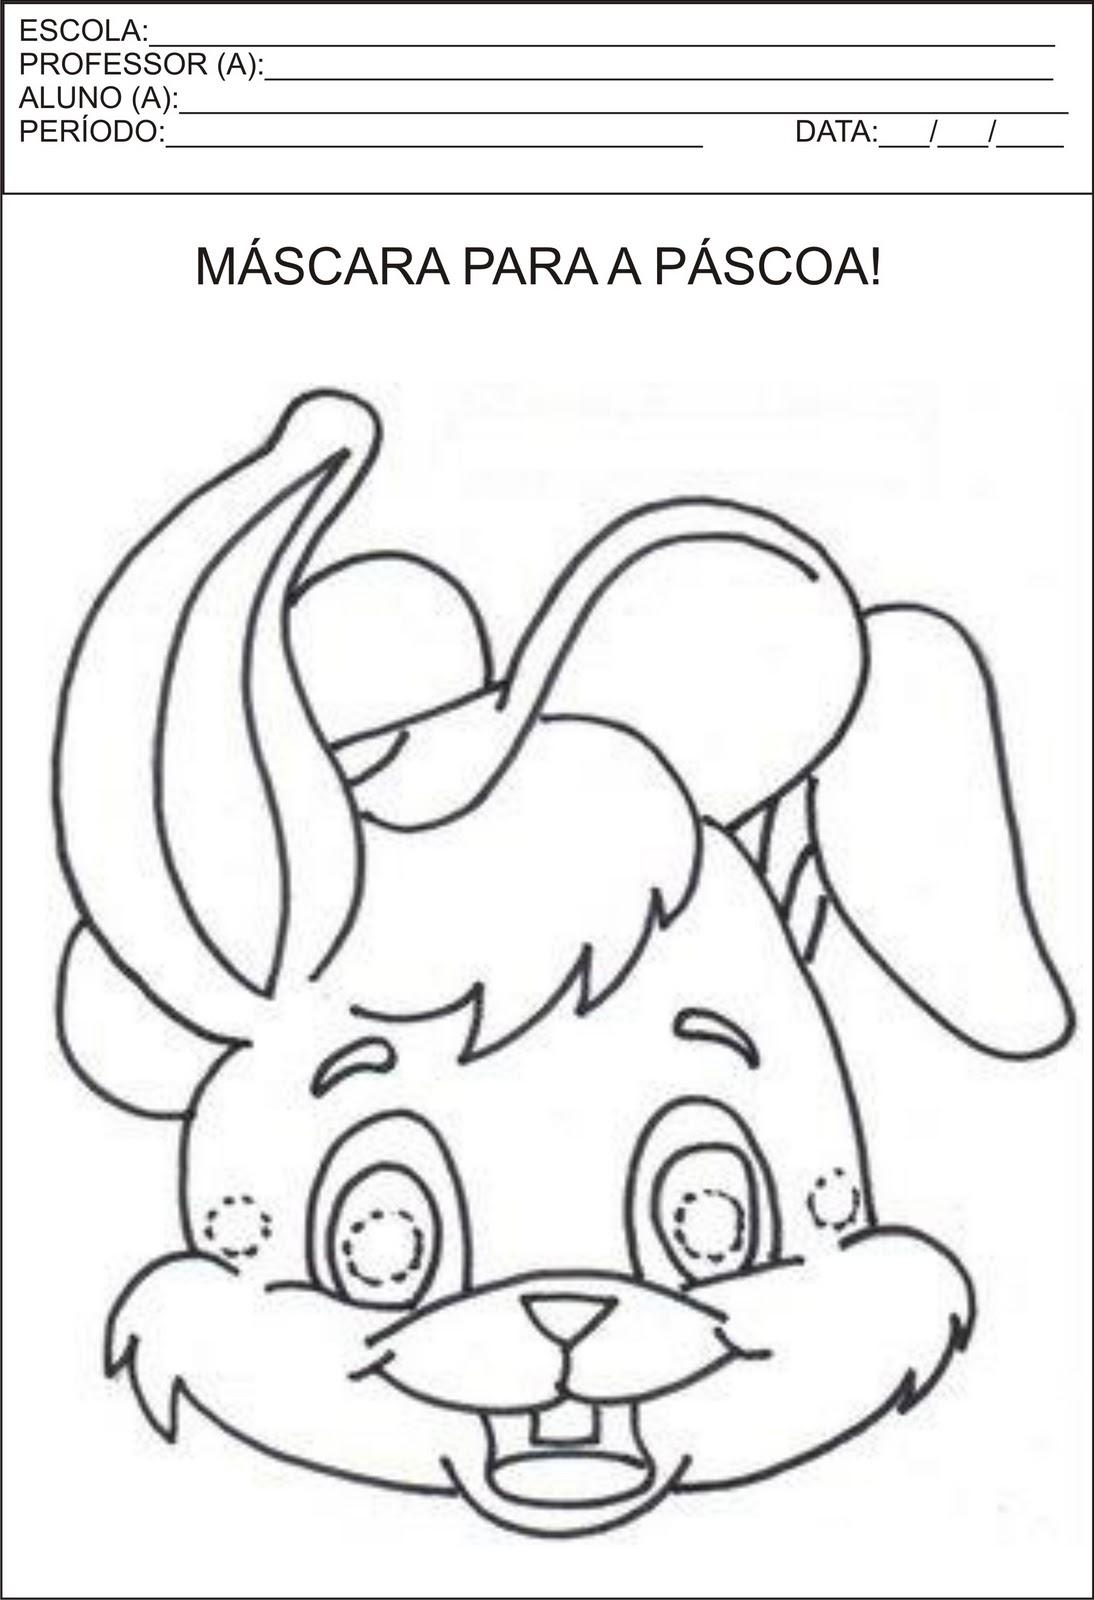 máscara de páscoa, máscara de coelhinho imprimir